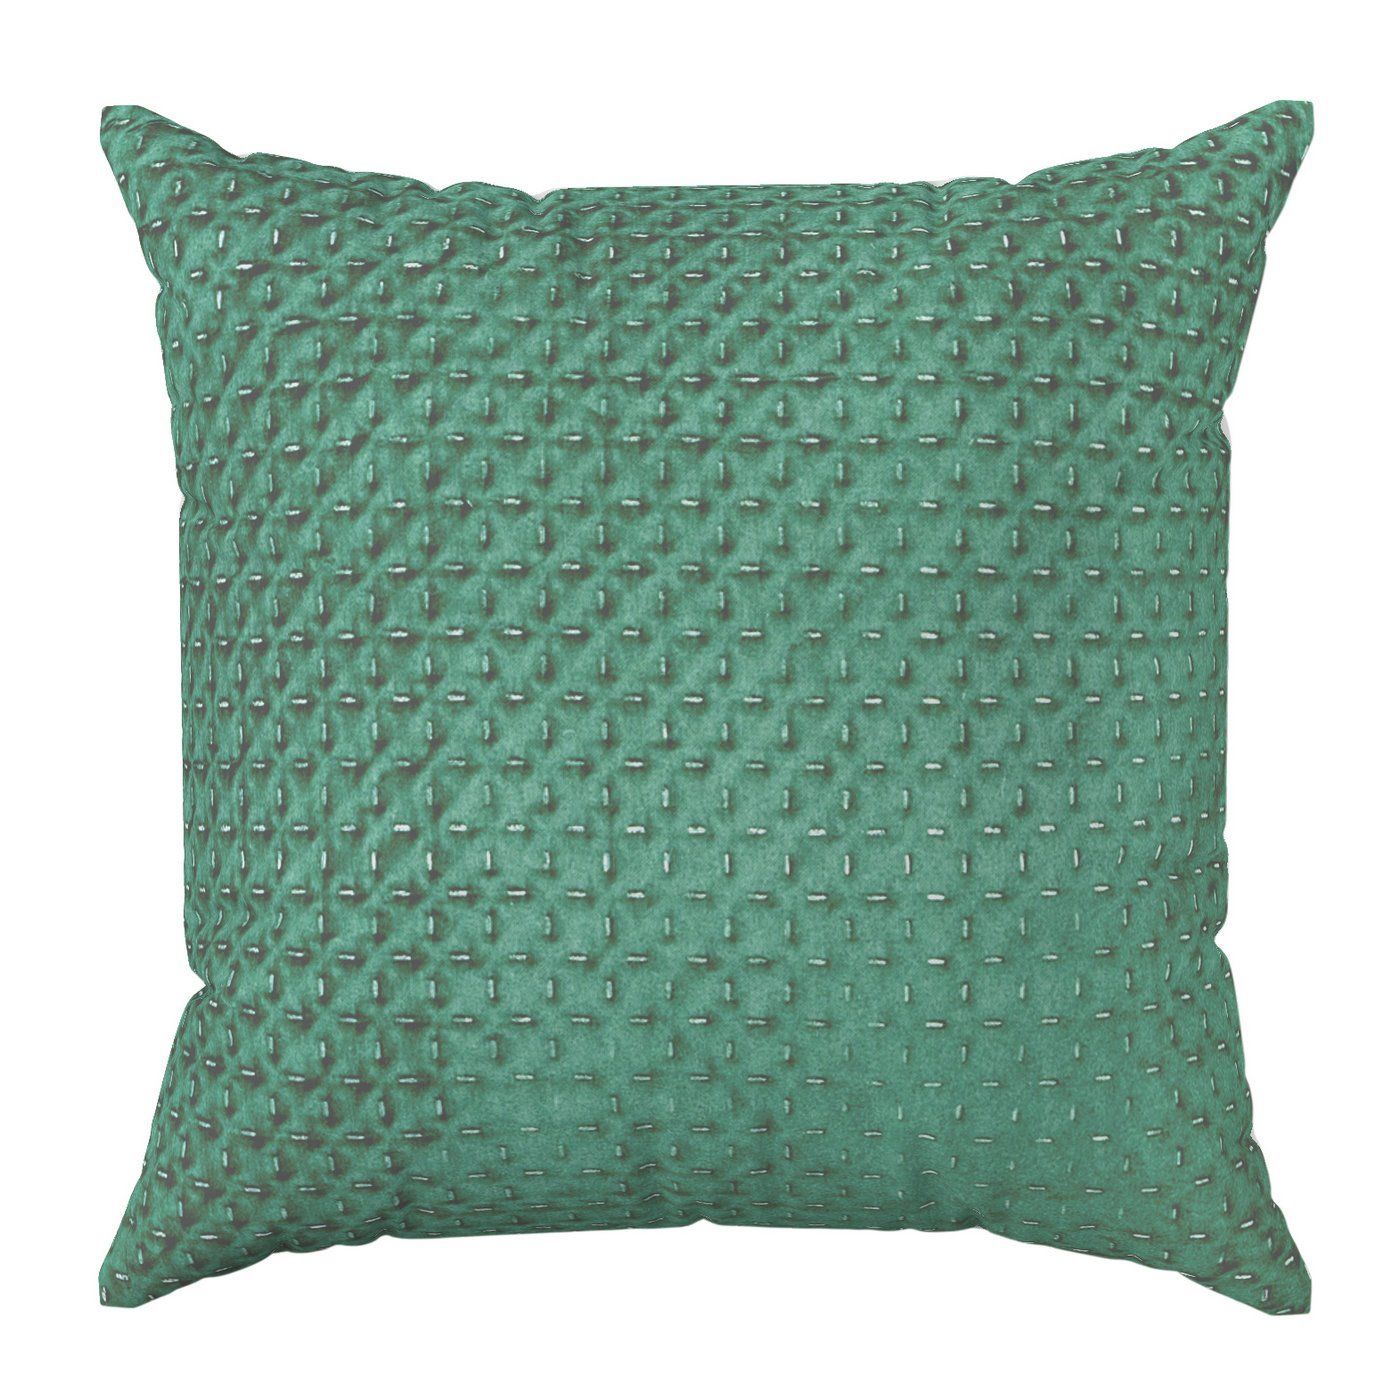 Poszewka na poduszkę dwustronna pikowana szaro-zielona 40 x 40 cm